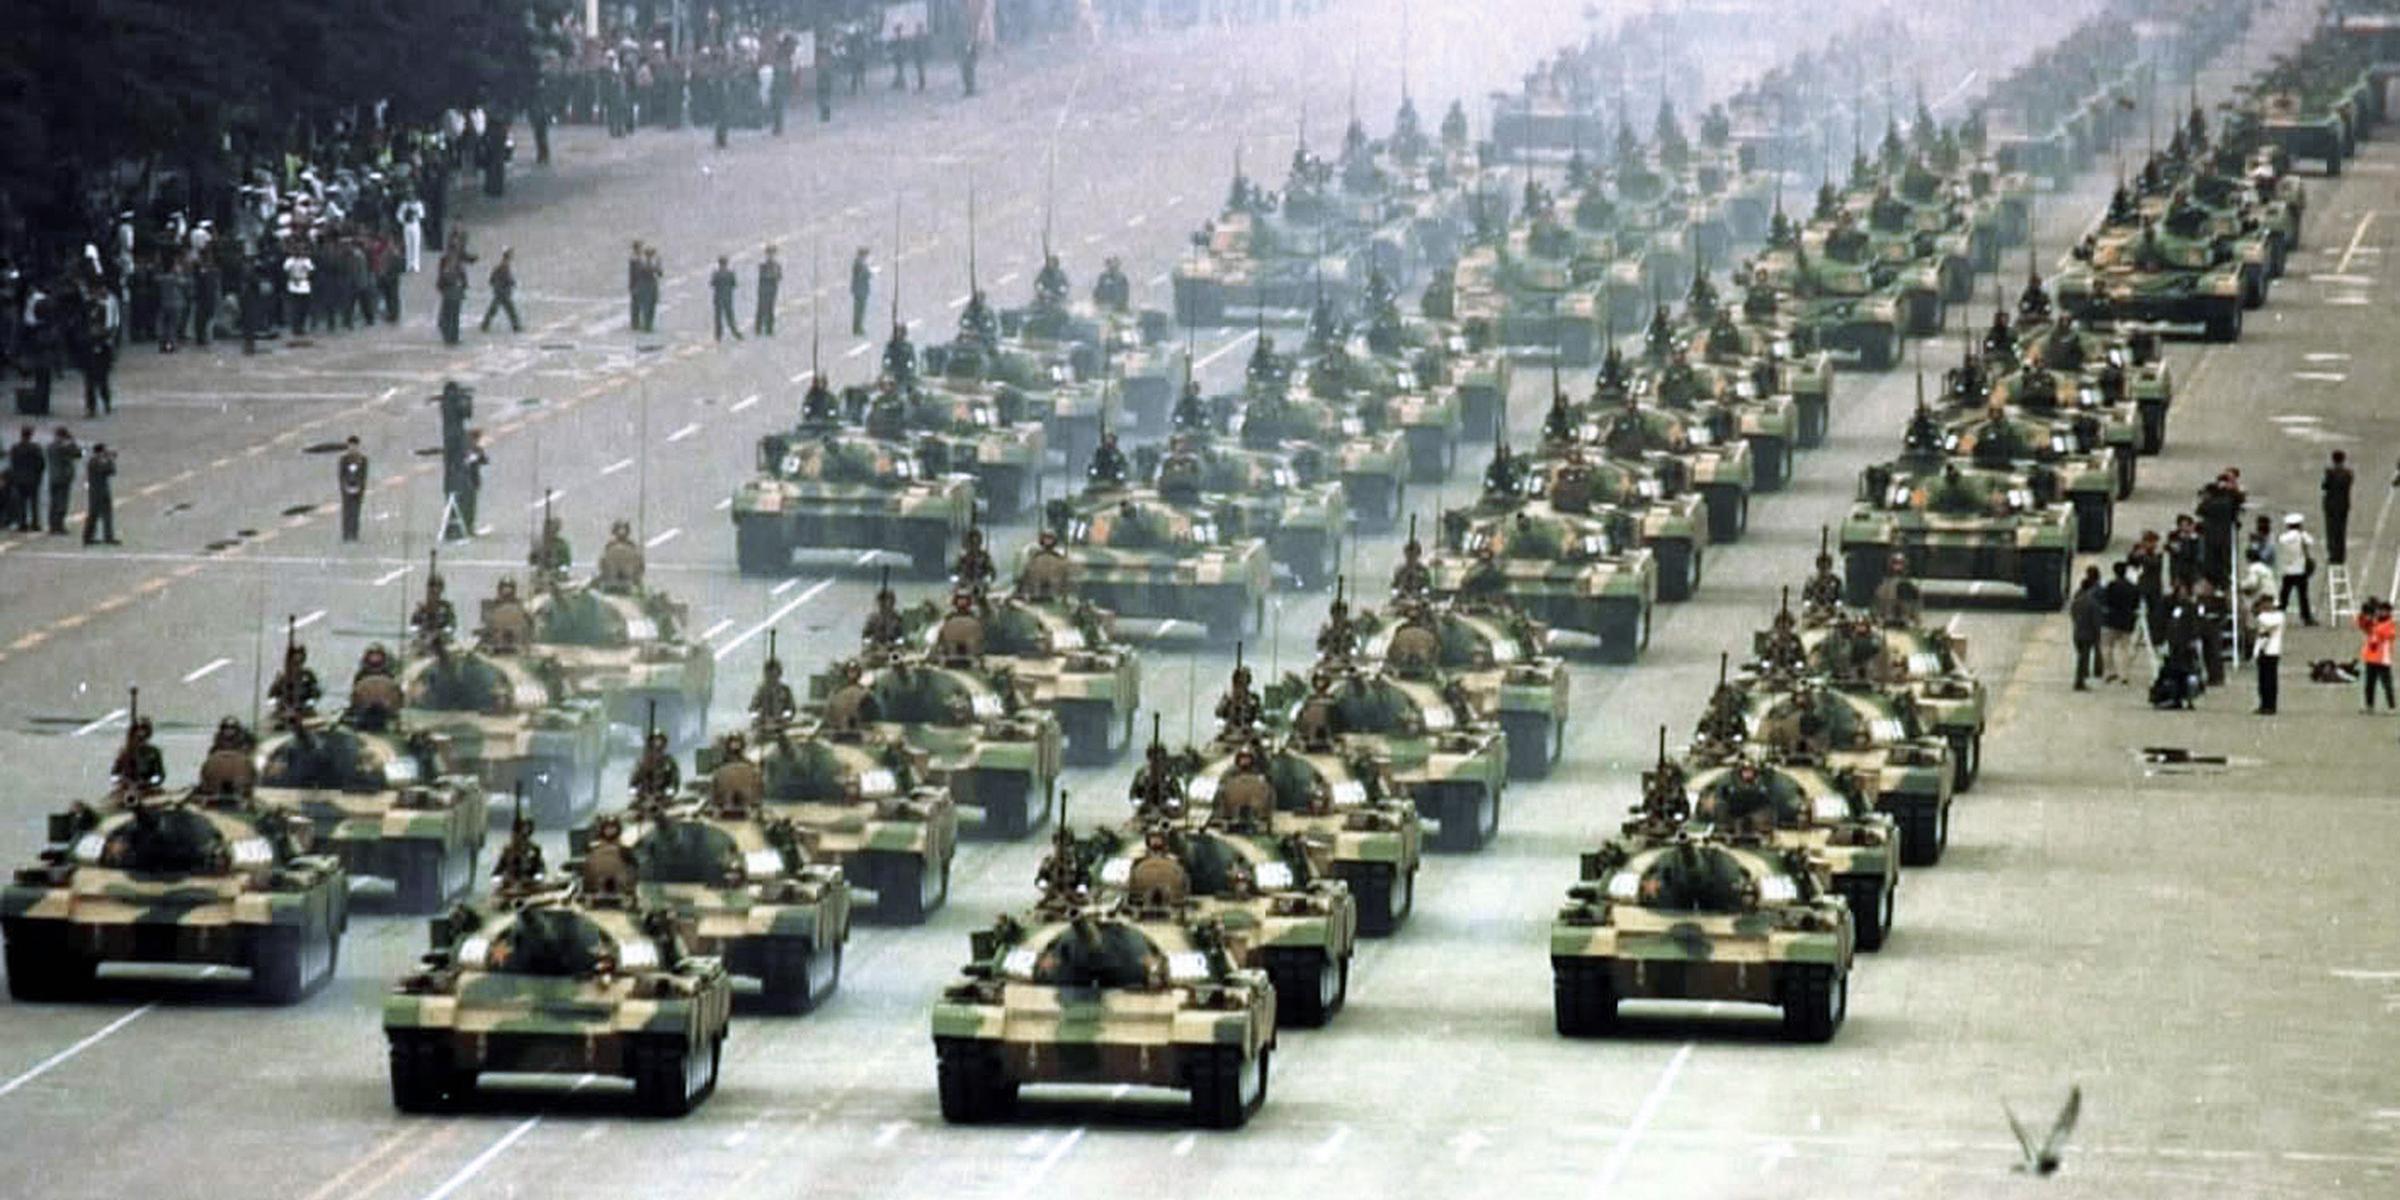 Tank formation, Tiananmen Square, Beijing, 1999. © Sovfoto/UIG/Bridgeman Images.